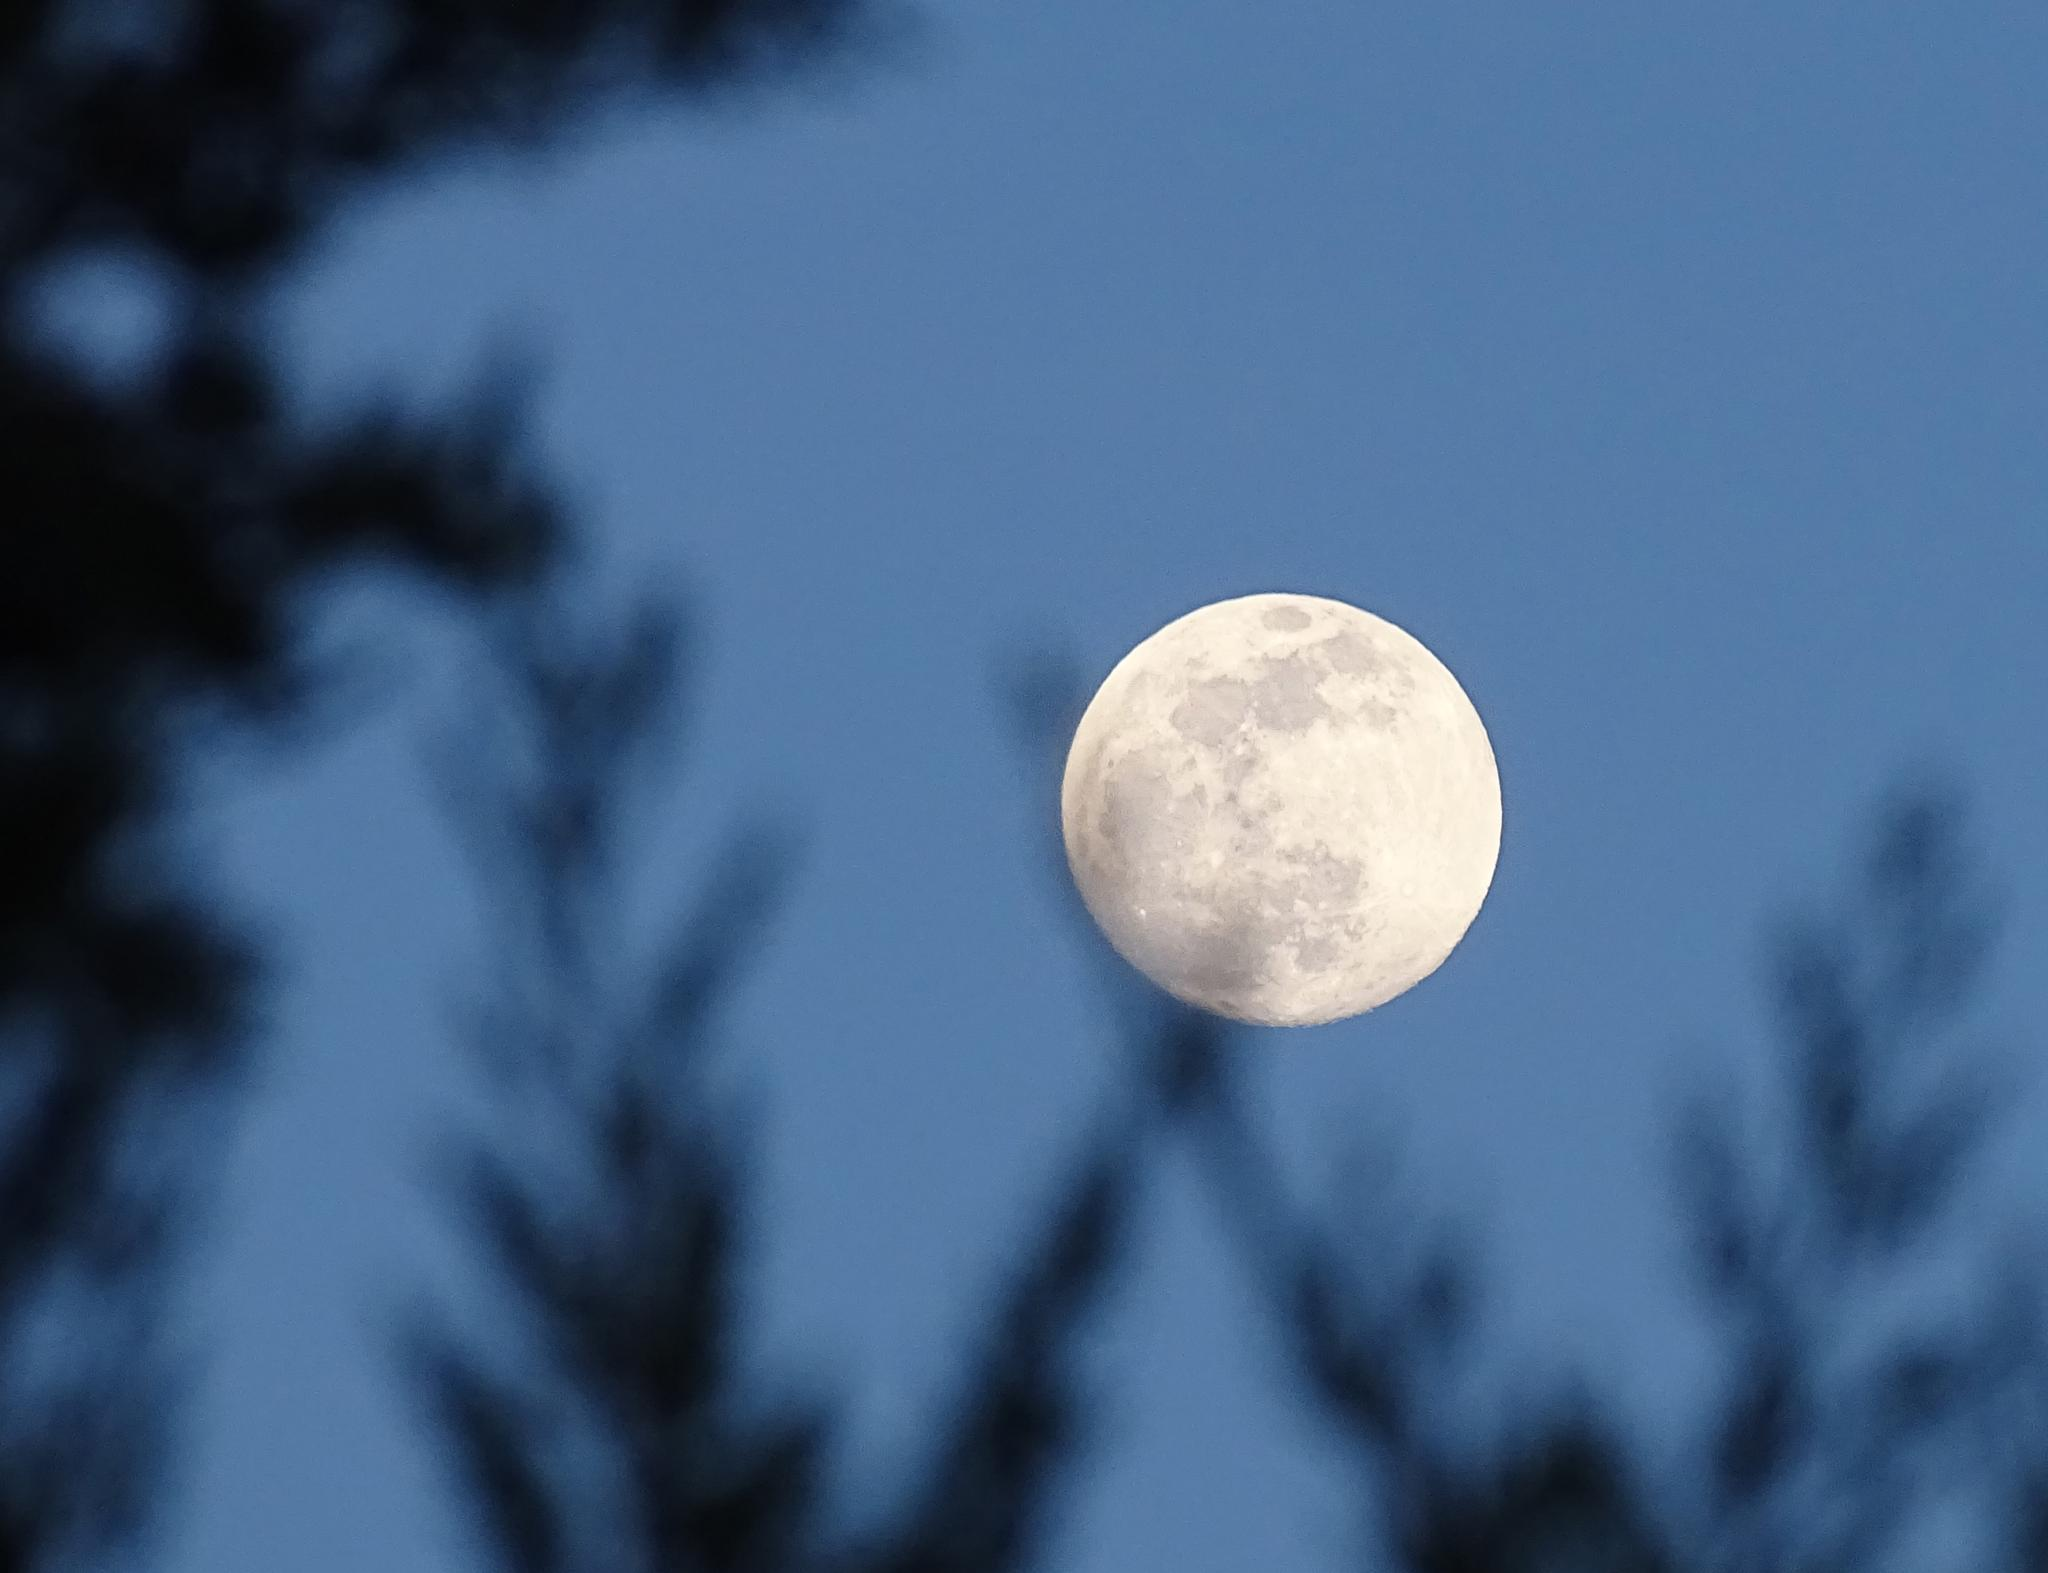 luna de mayo by lola.garciaayala